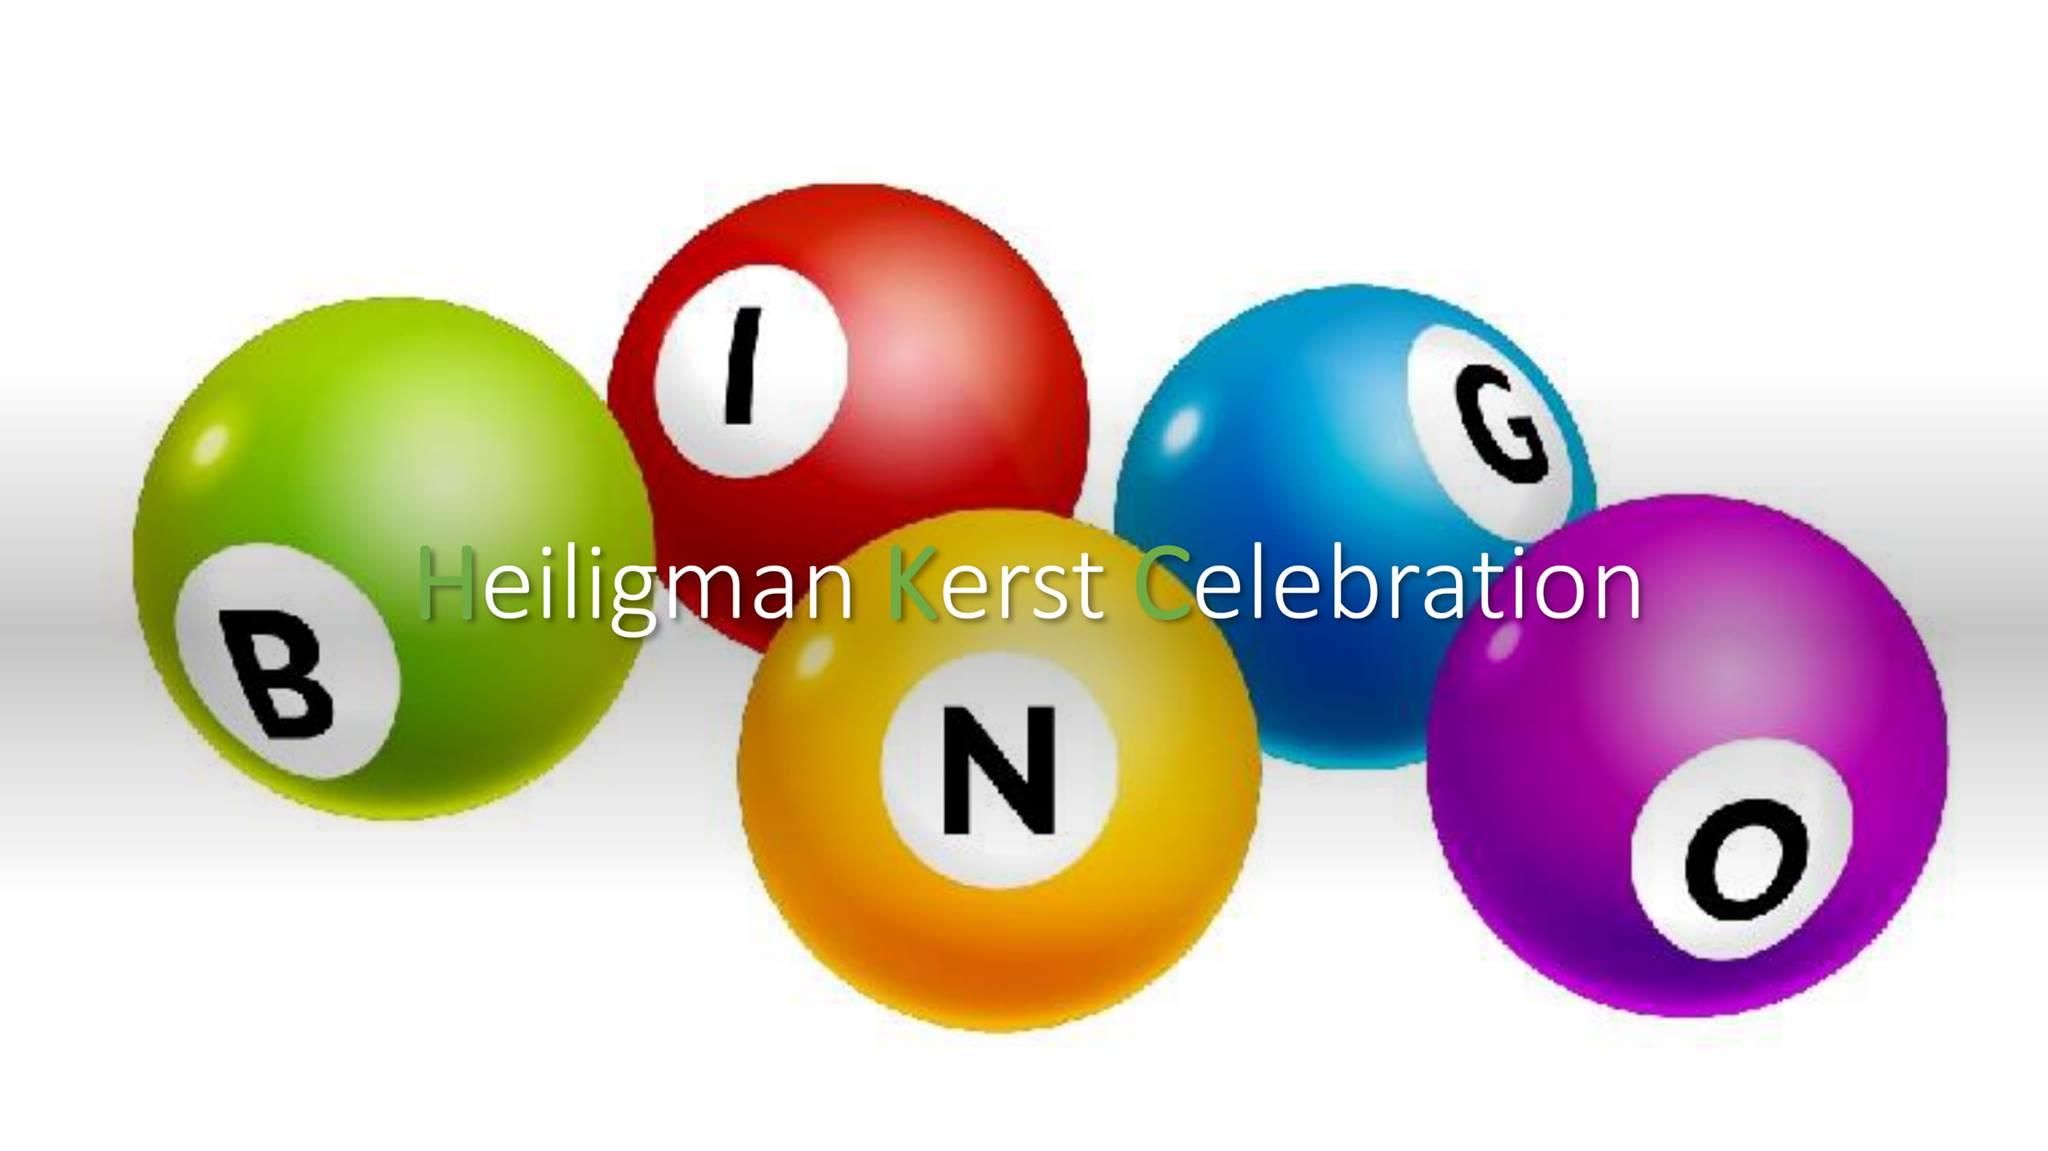 Heiligman Kerst Celebration   Bingo za 12 dec